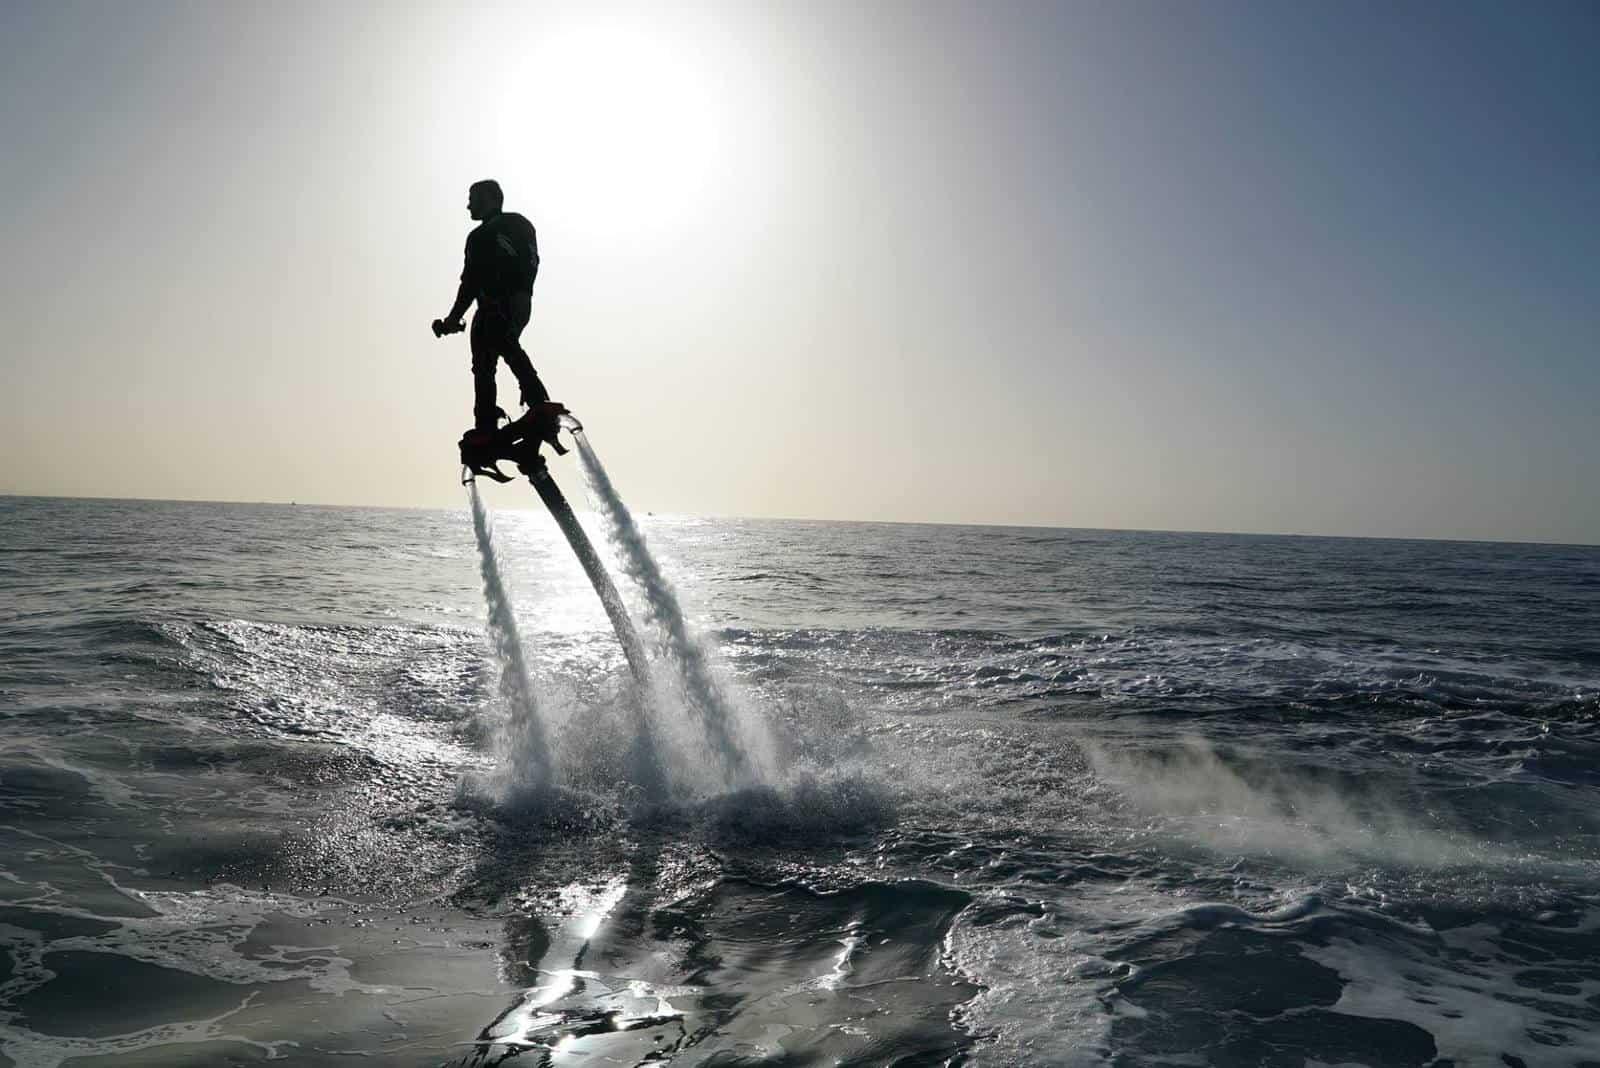 homme volant, L'homme volant a battu le record du monde à Carry le Rouet !, Made in Marseille, Made in Marseille